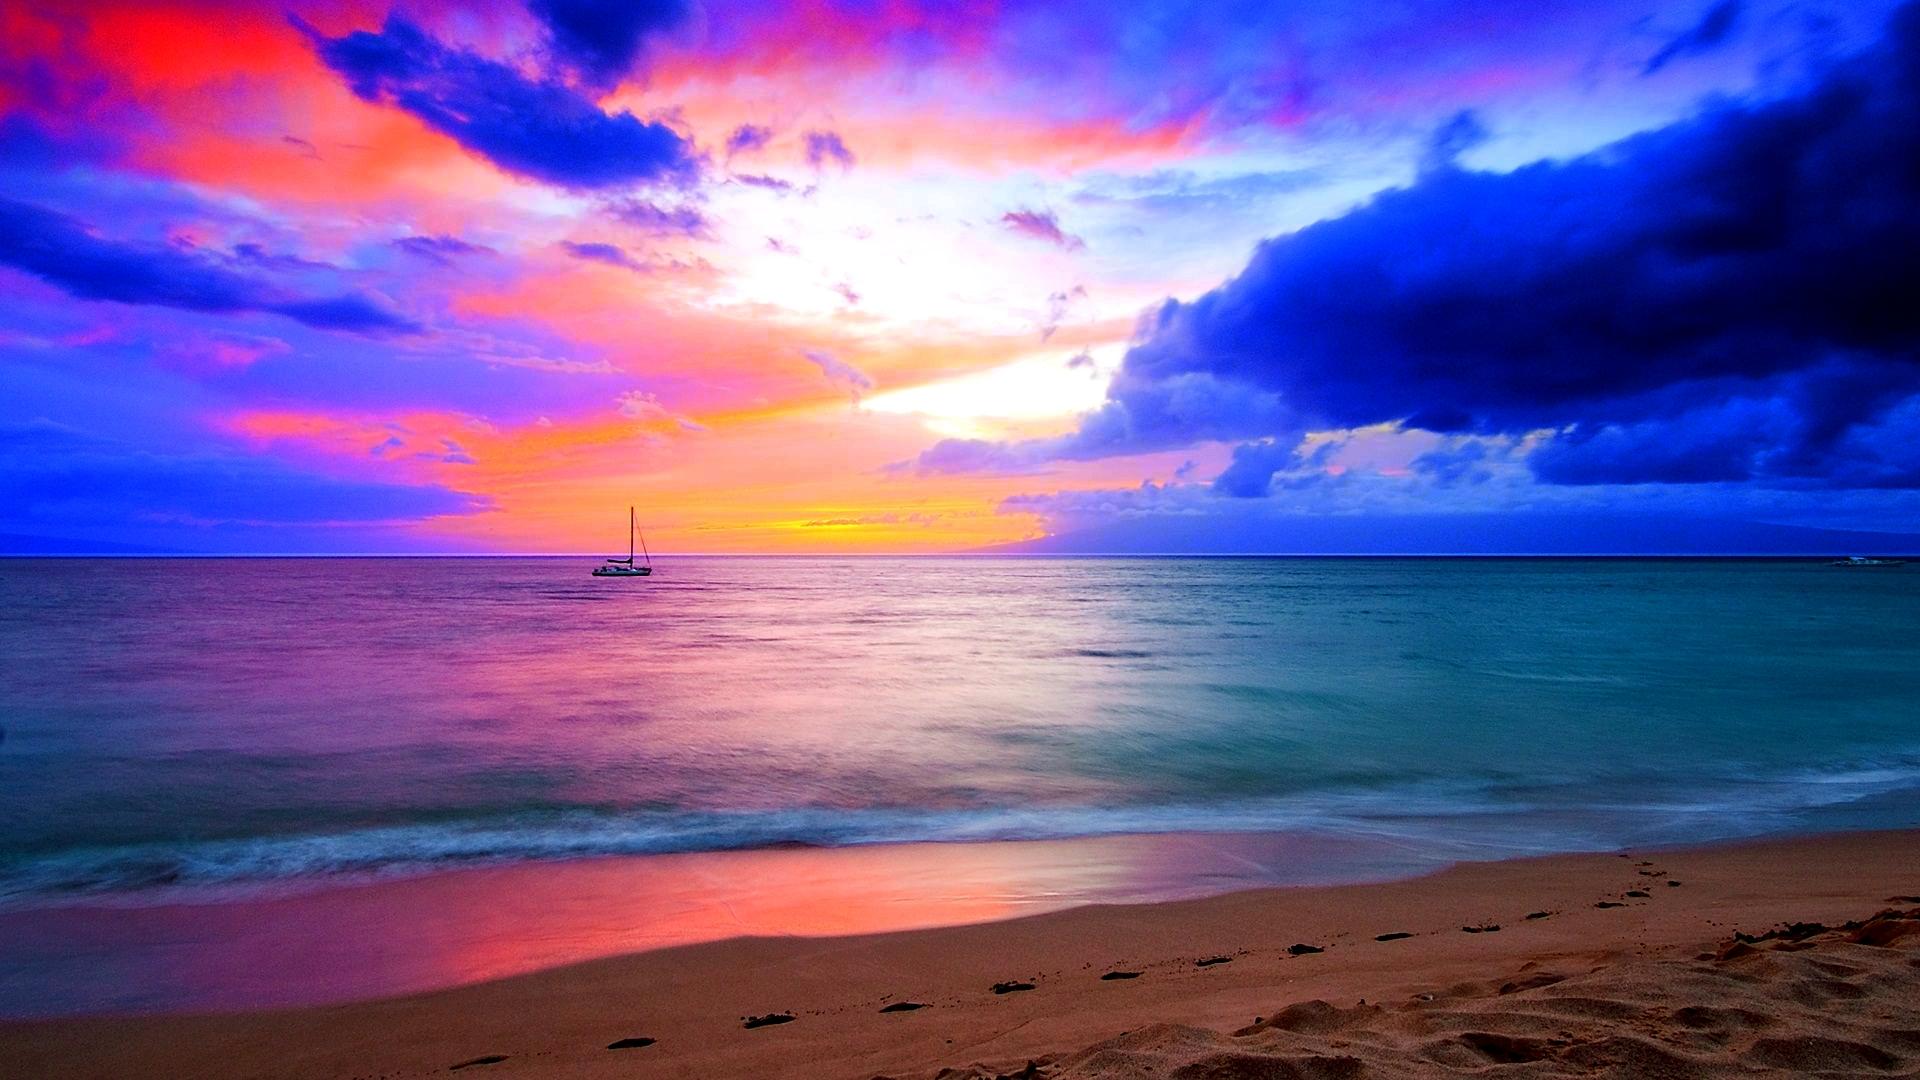 Beach HD Wallpaper   Background Image   1920x1080   ID ...